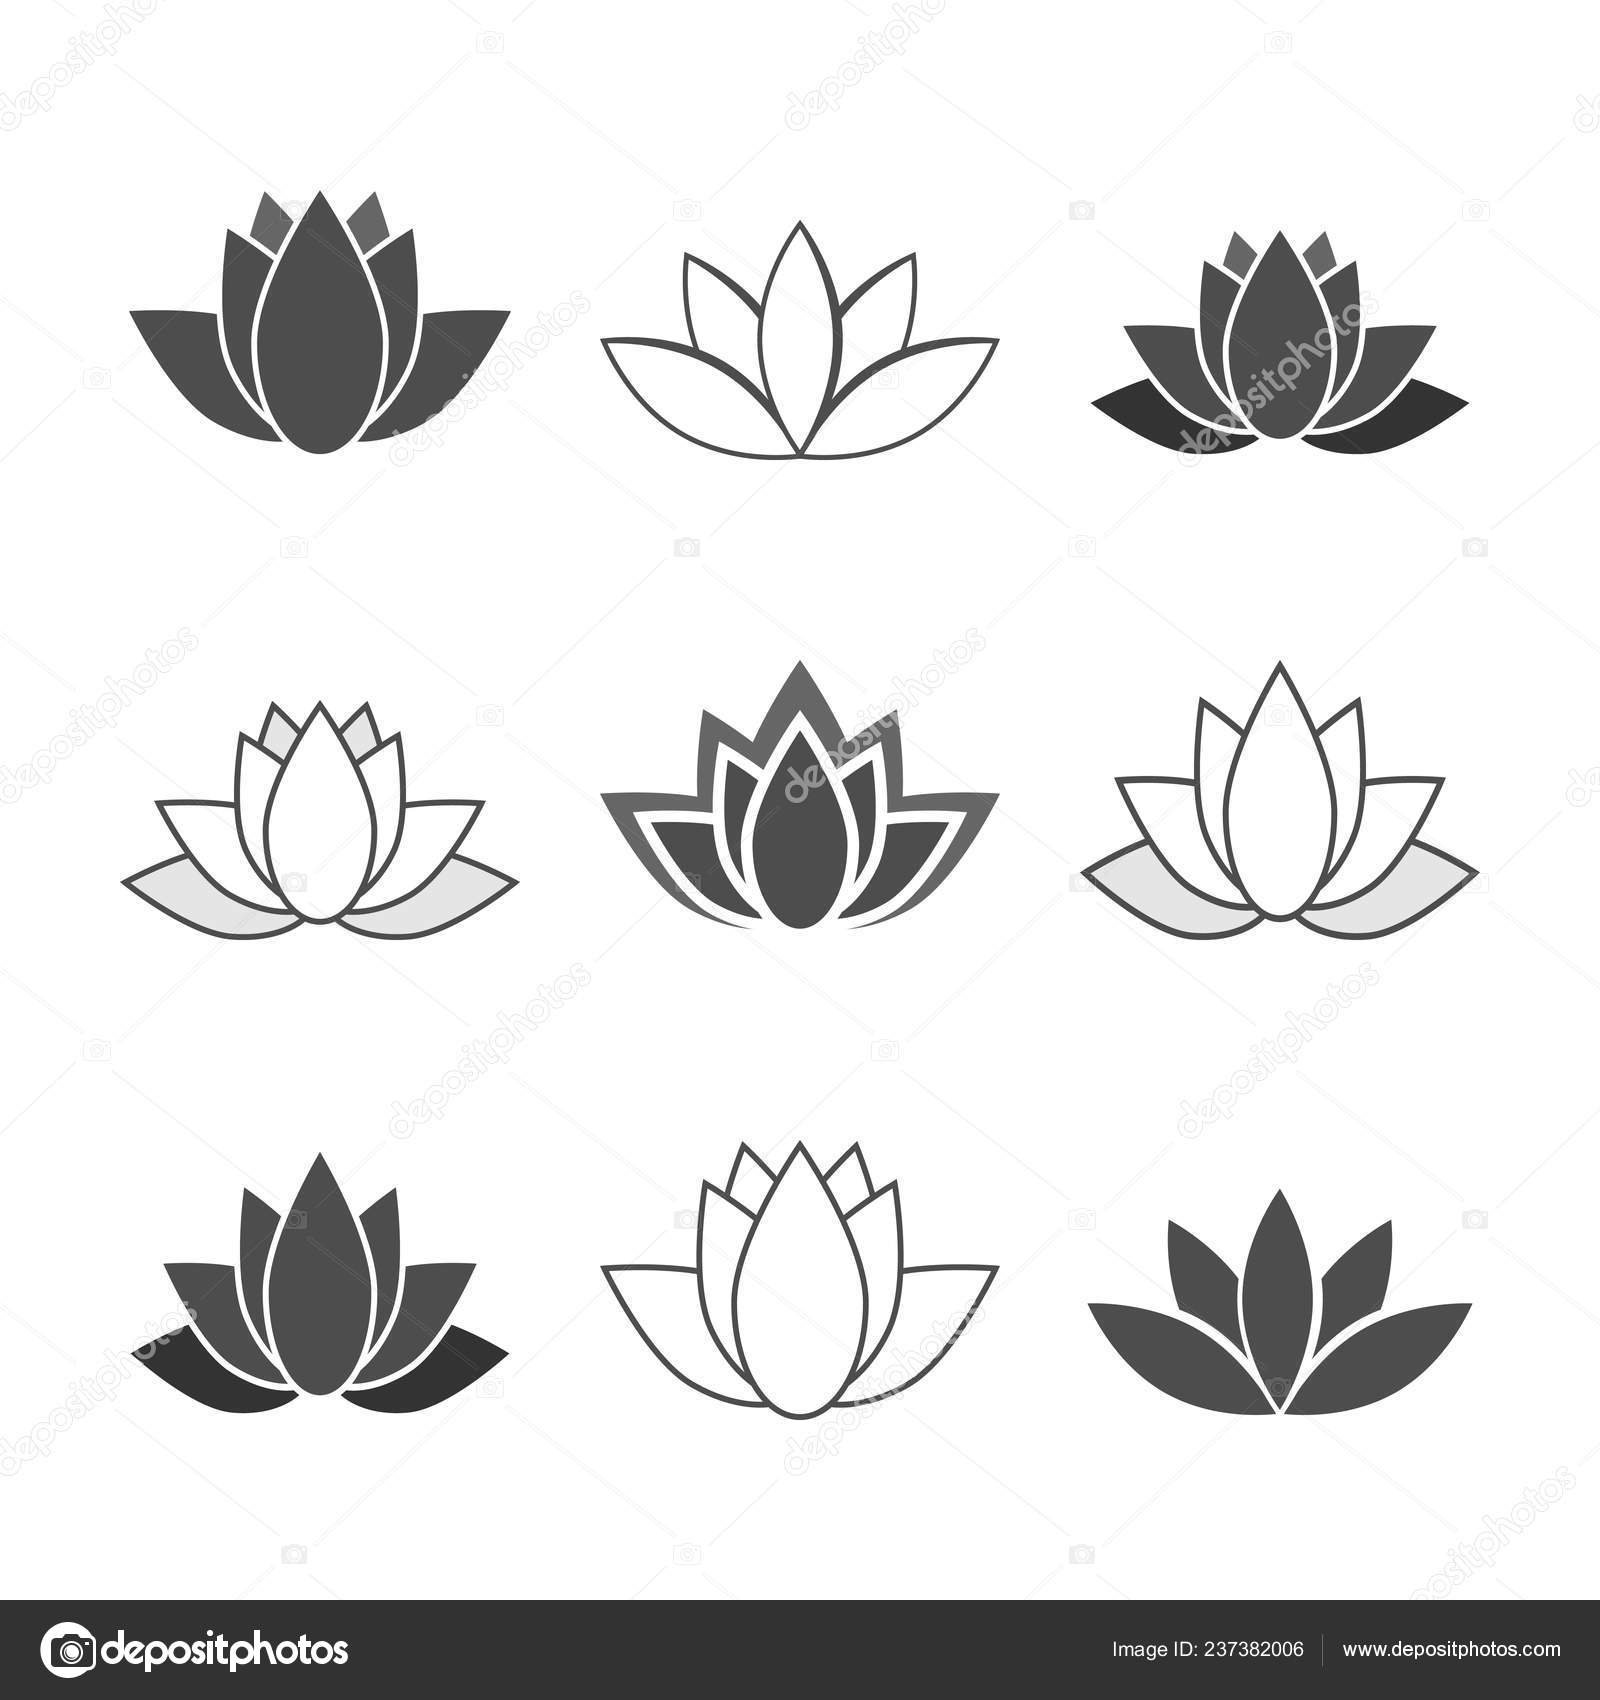 Lotus Flower Illustrations Editable Icons Stock Vector Ii